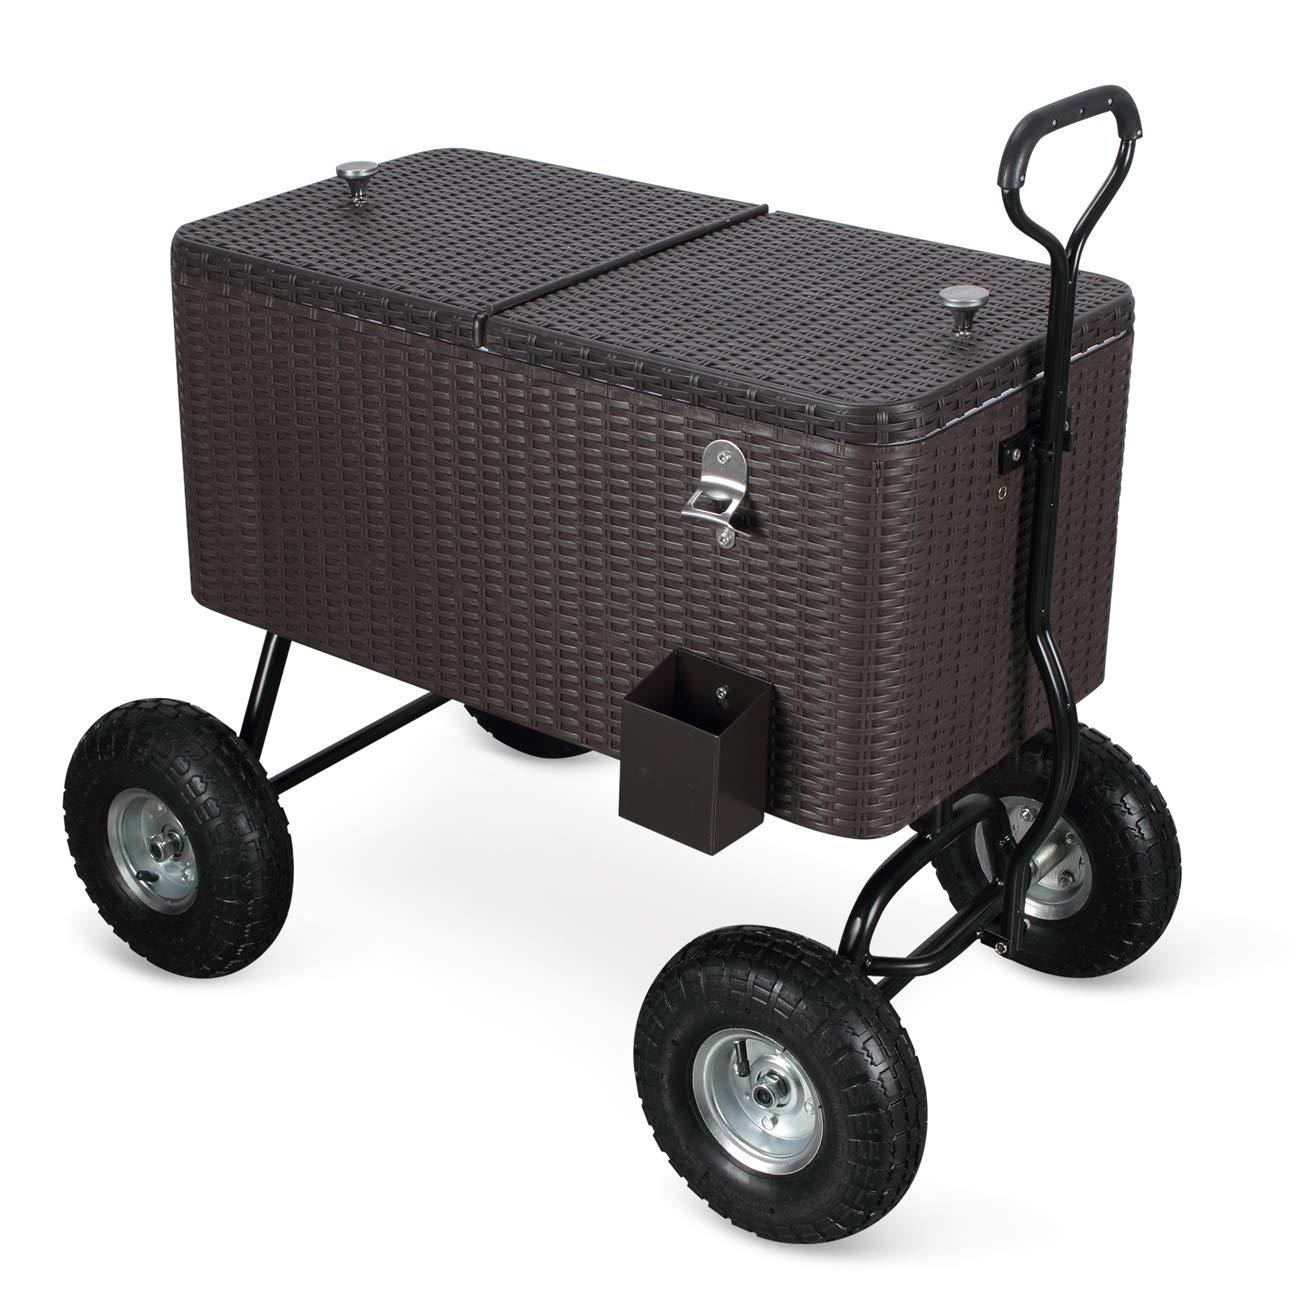 Belleze 80 Qt Portable Rolling 10' All Terrain Wheels Outdoor Backyard Party Beach Drink Cooler (Rattan) by Belleze